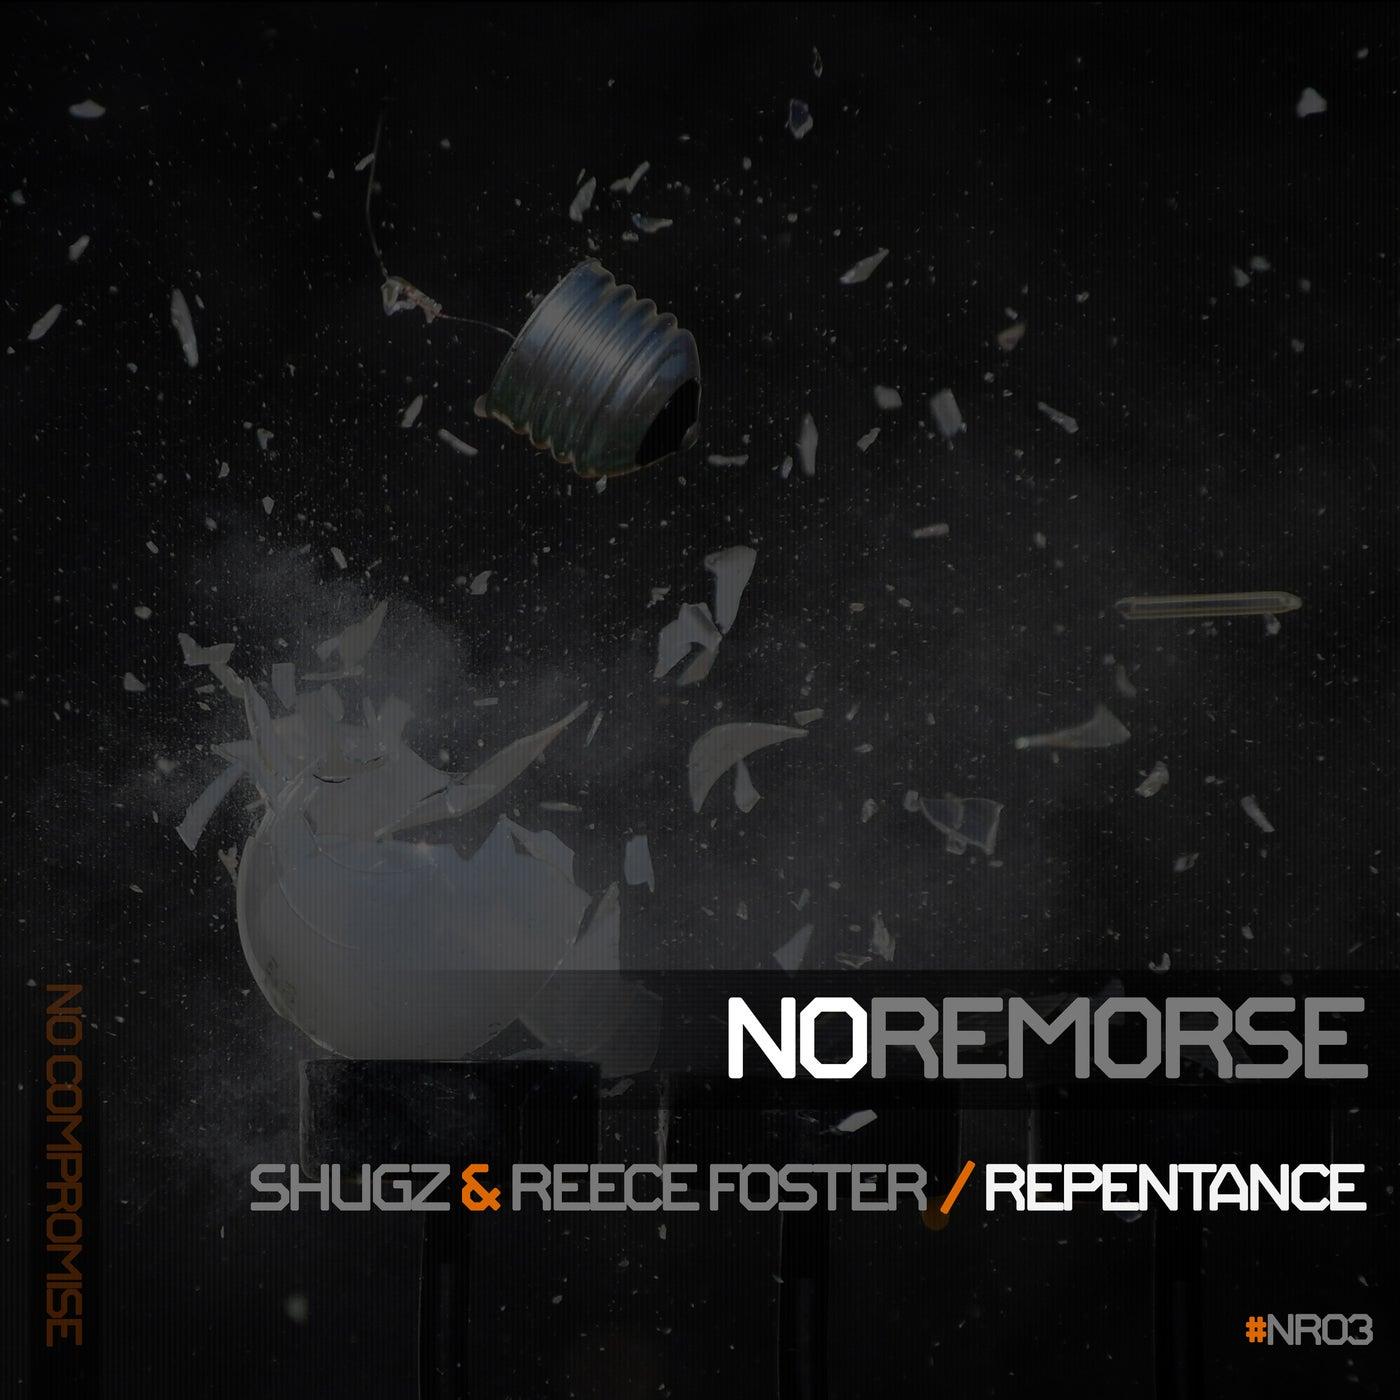 Repentance (Original Mix)